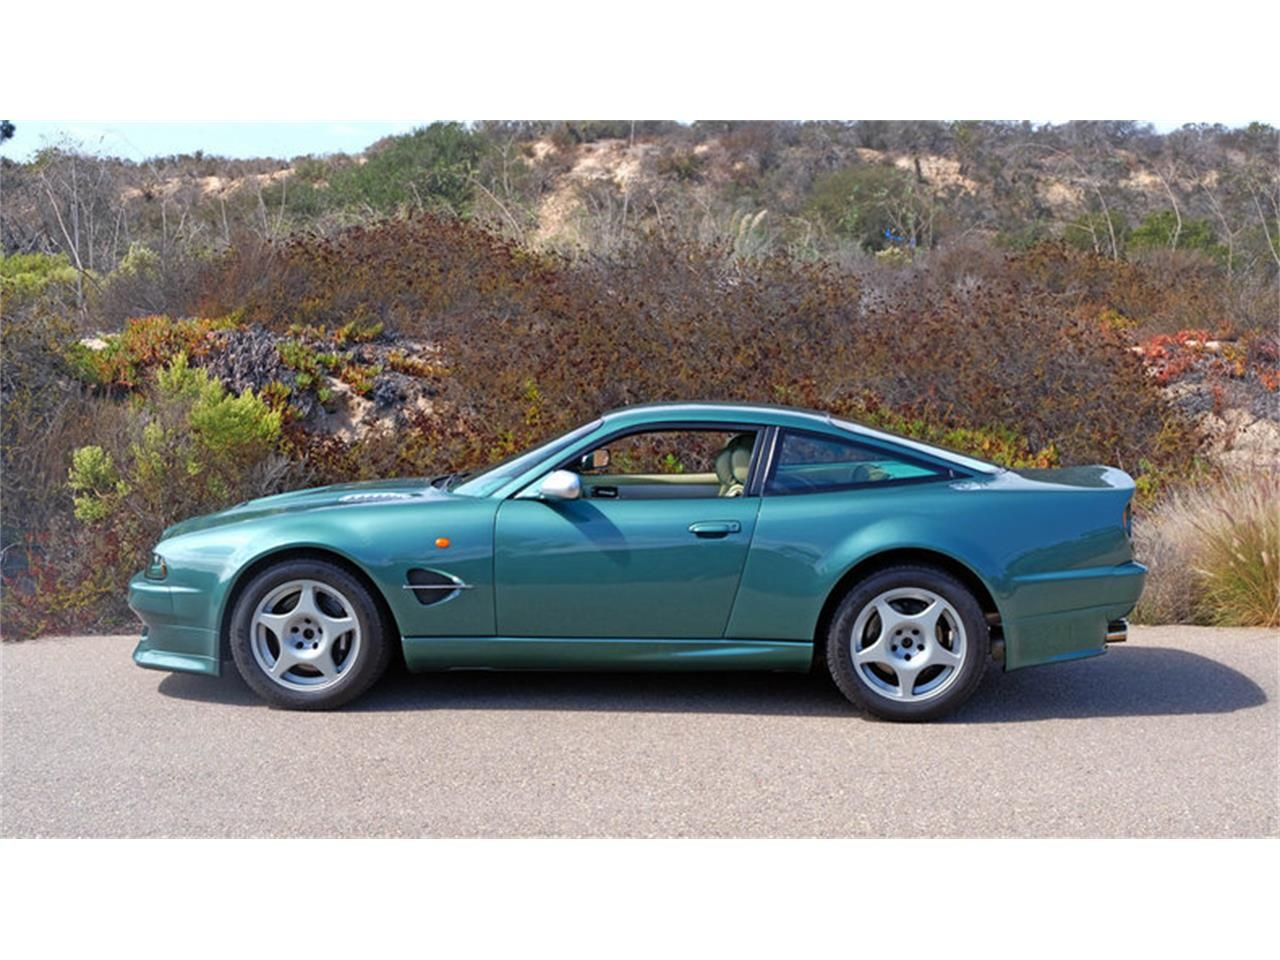 New Car Old Car 1999 Aston Martin Vantage Https Newcaroldcar